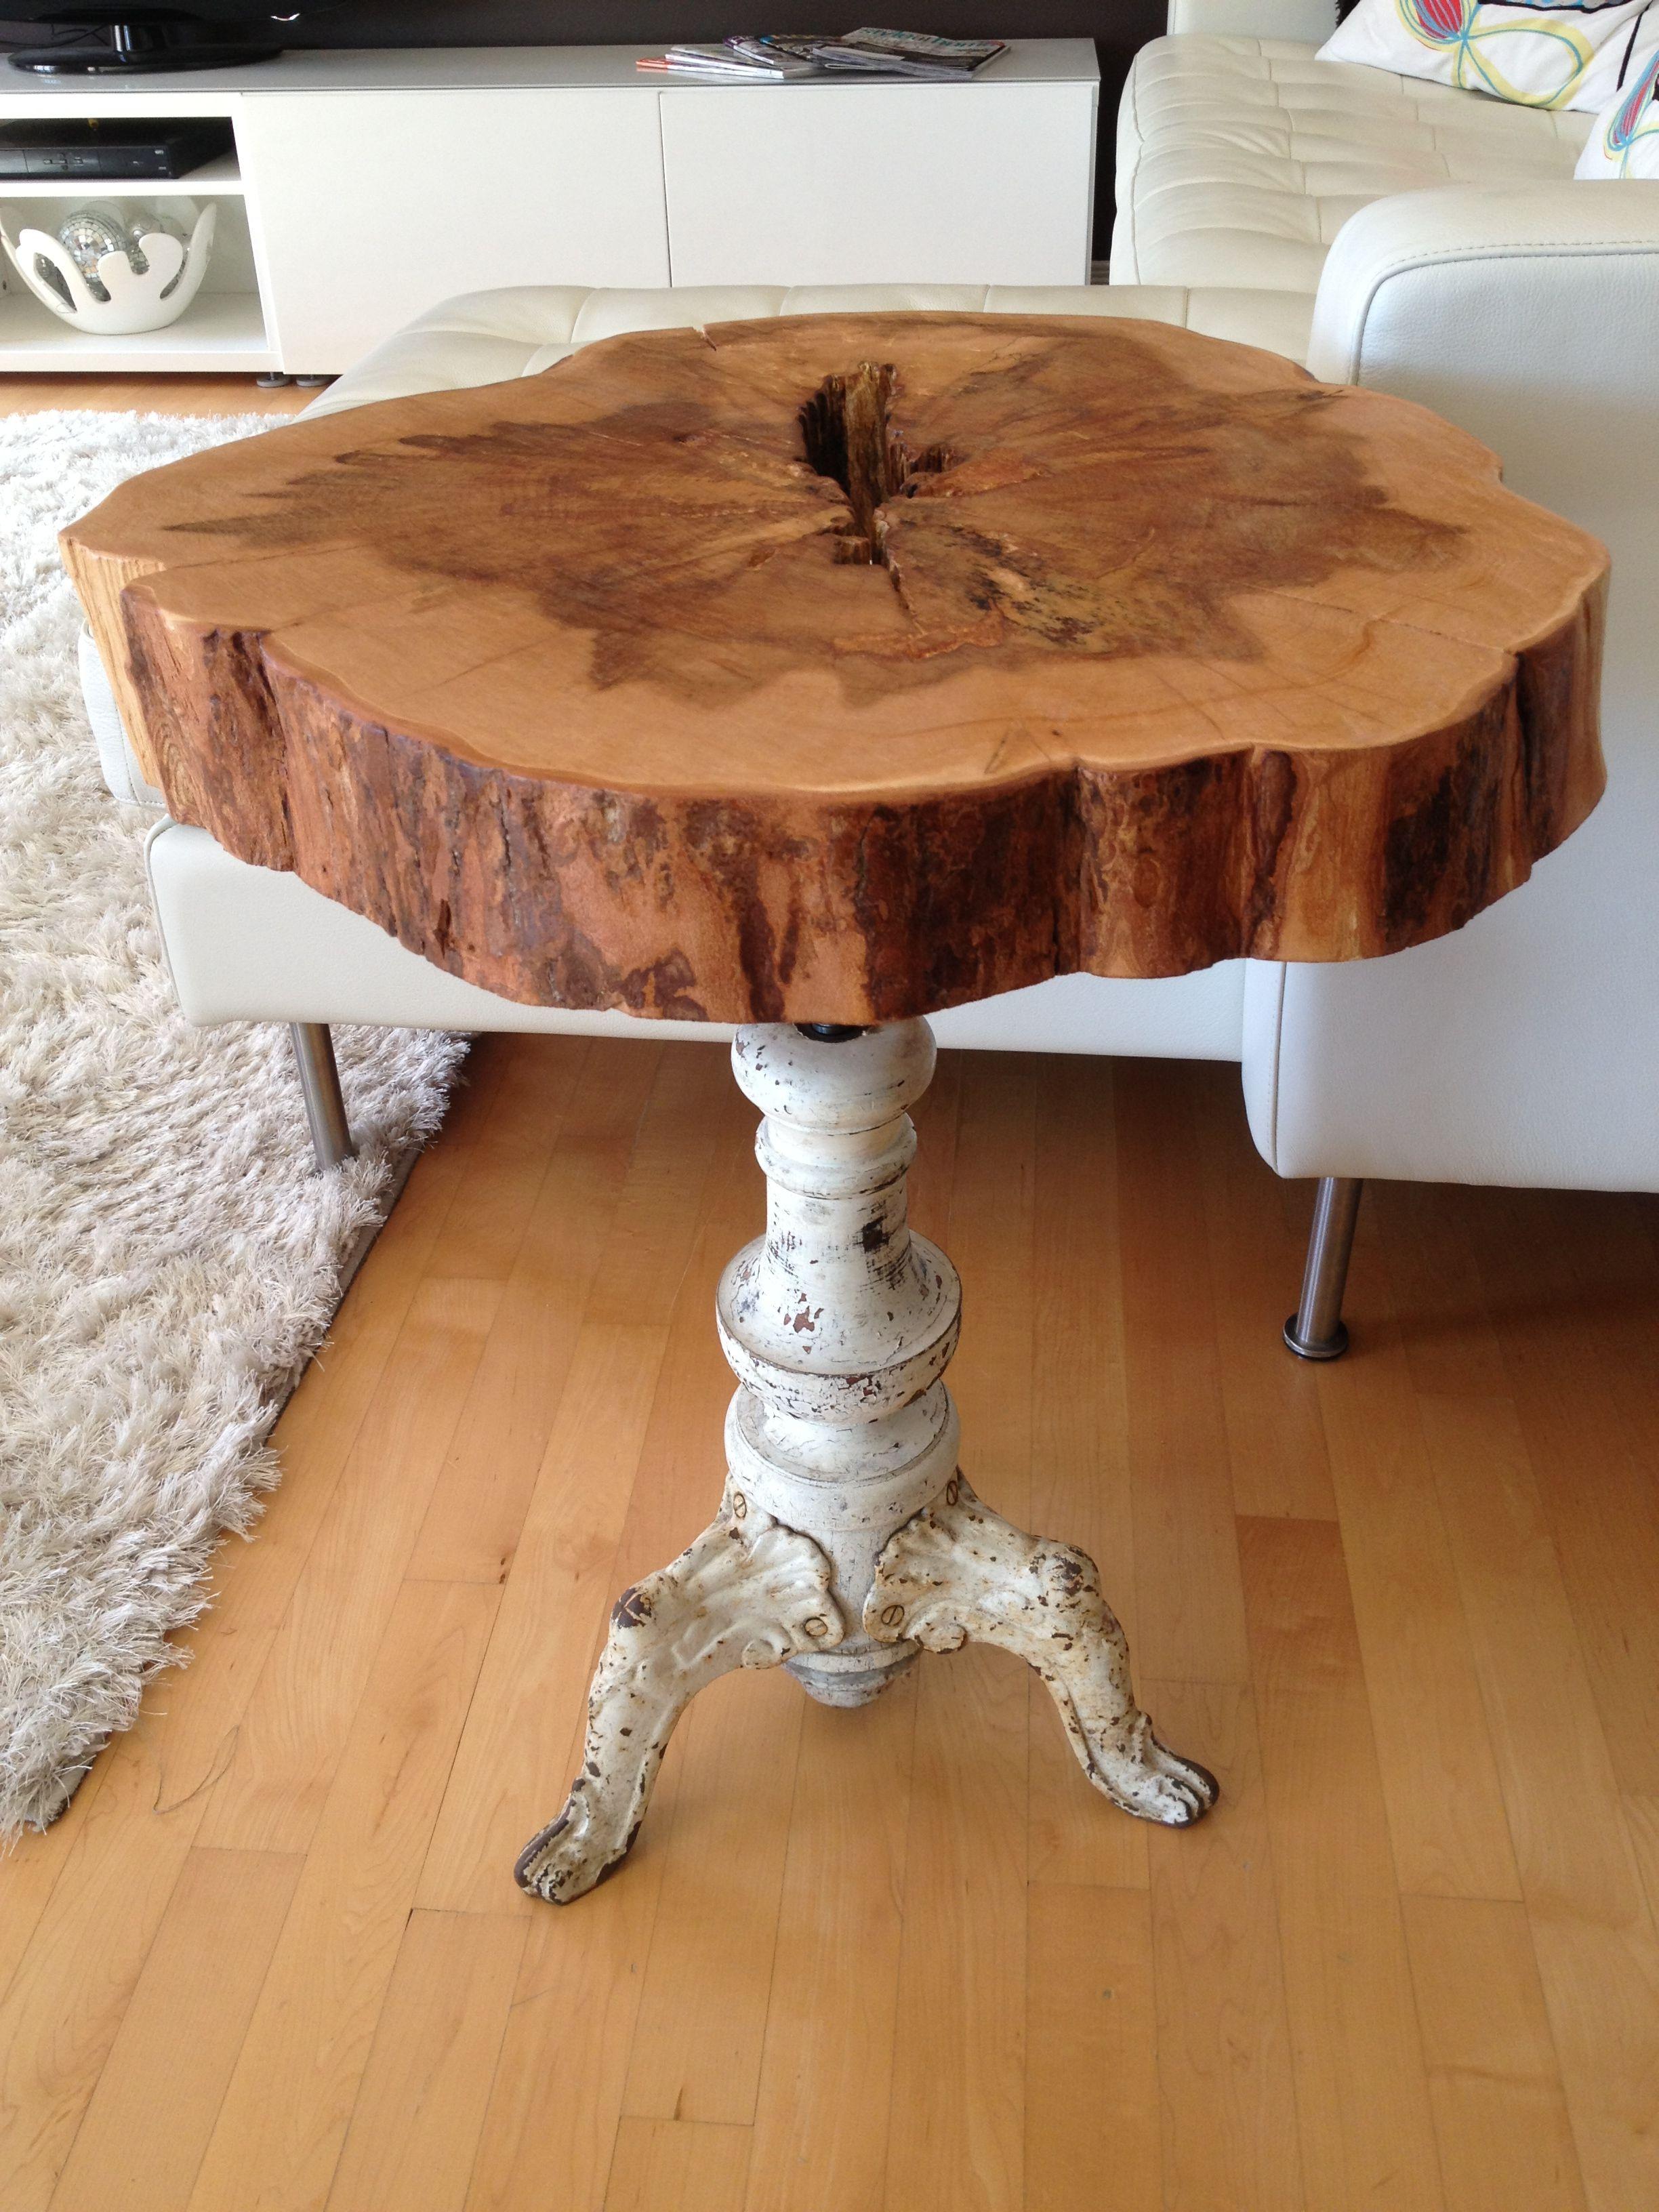 DIY Tree Stump Table Ideas Amp How To Make Them DIY Tree